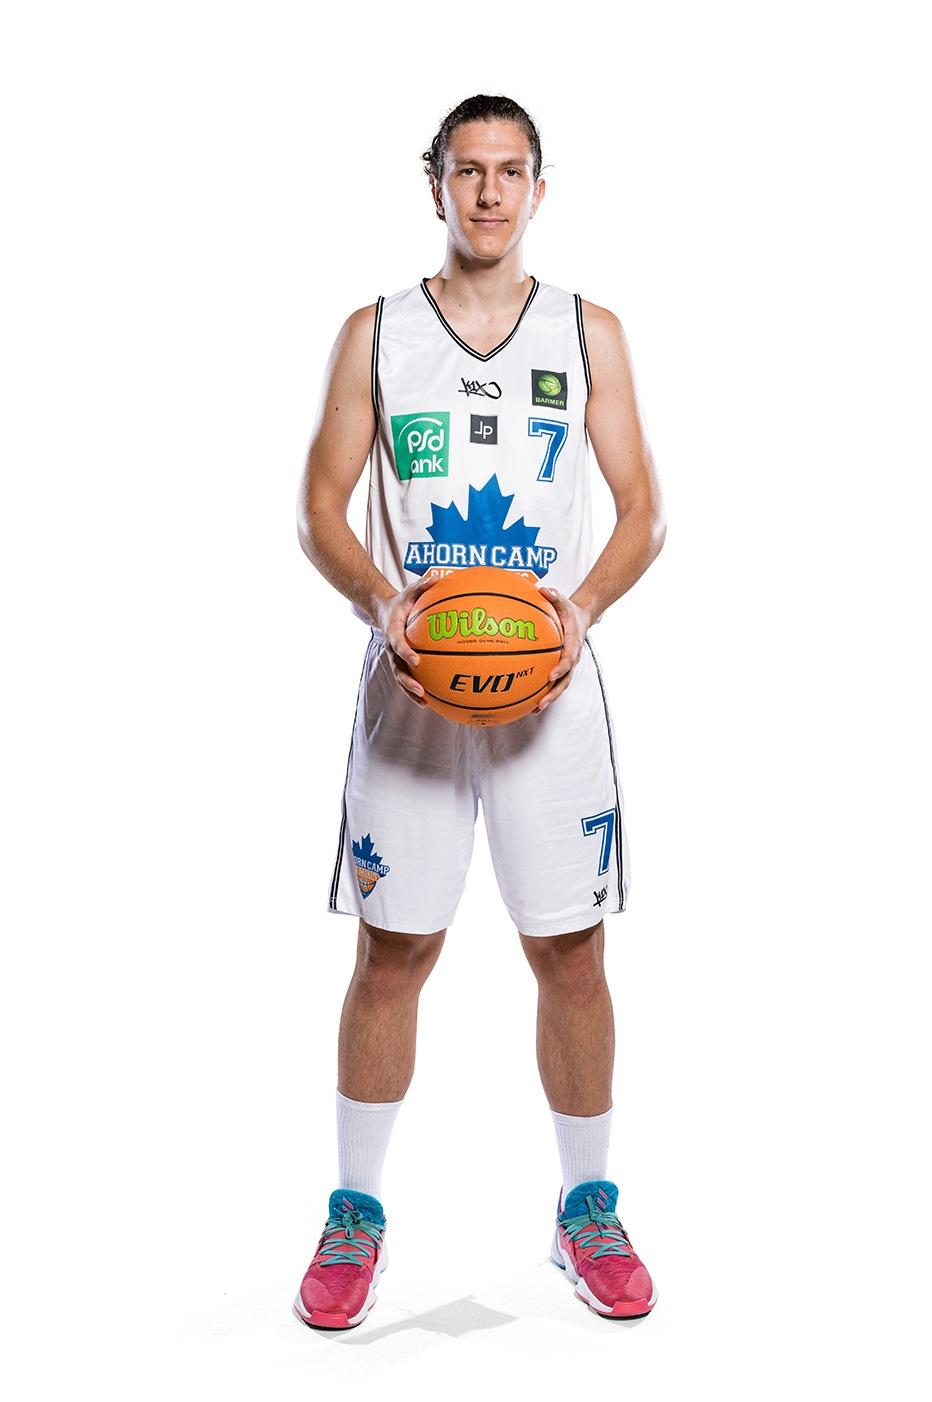 Tim Gabriel Kalocai